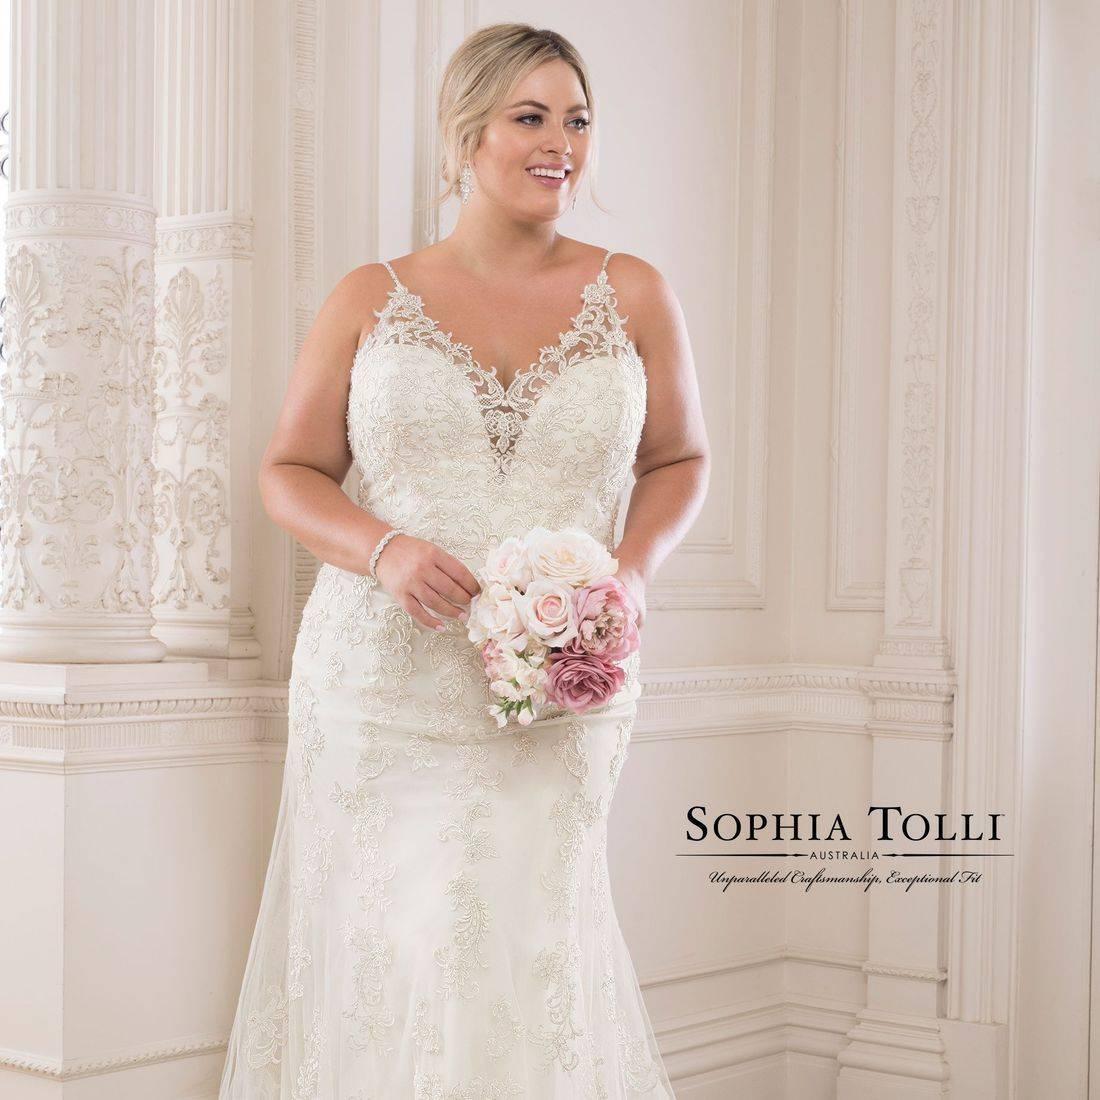 Fitted wedding dress, sophia tolli, sophia tolli wedding dress, spaghettin straps, straps, v neck, sweetheart neck, lace, plus size, deep v back, illusion,